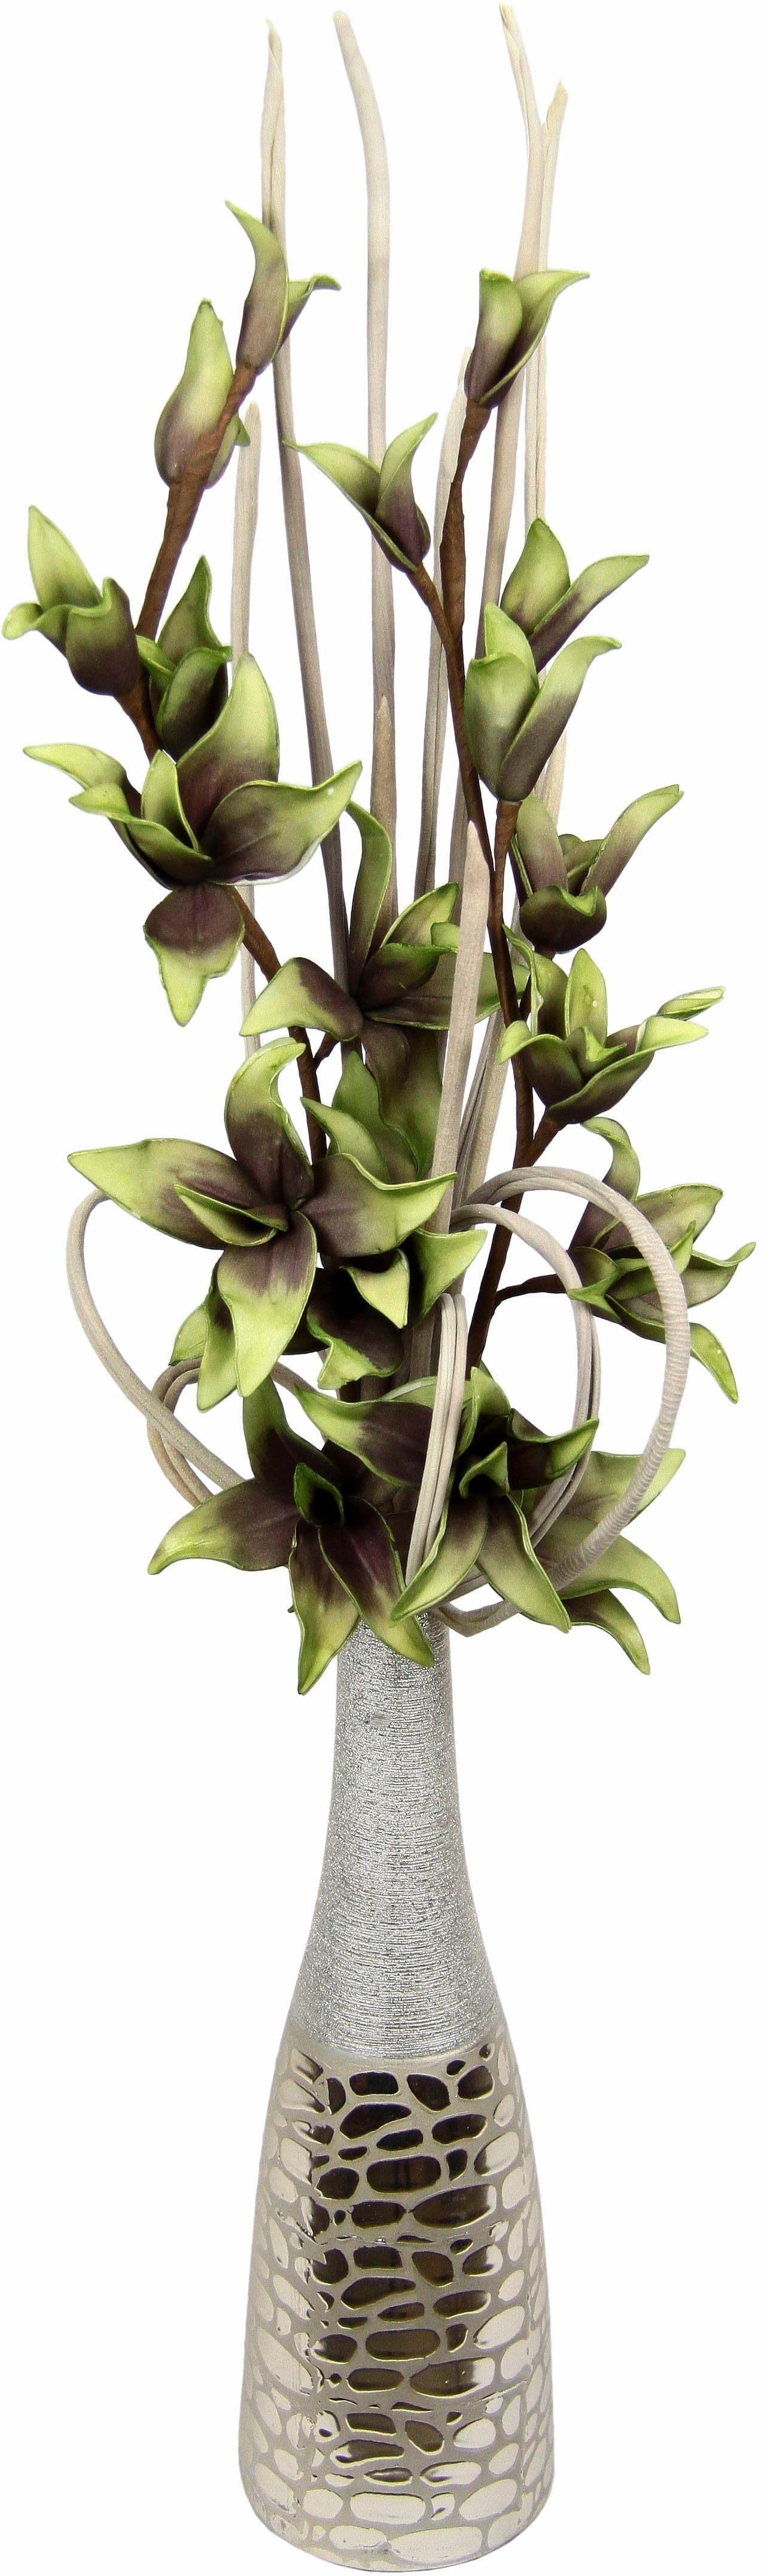 Home affaire Kunstblume »Soft-Orchidee«